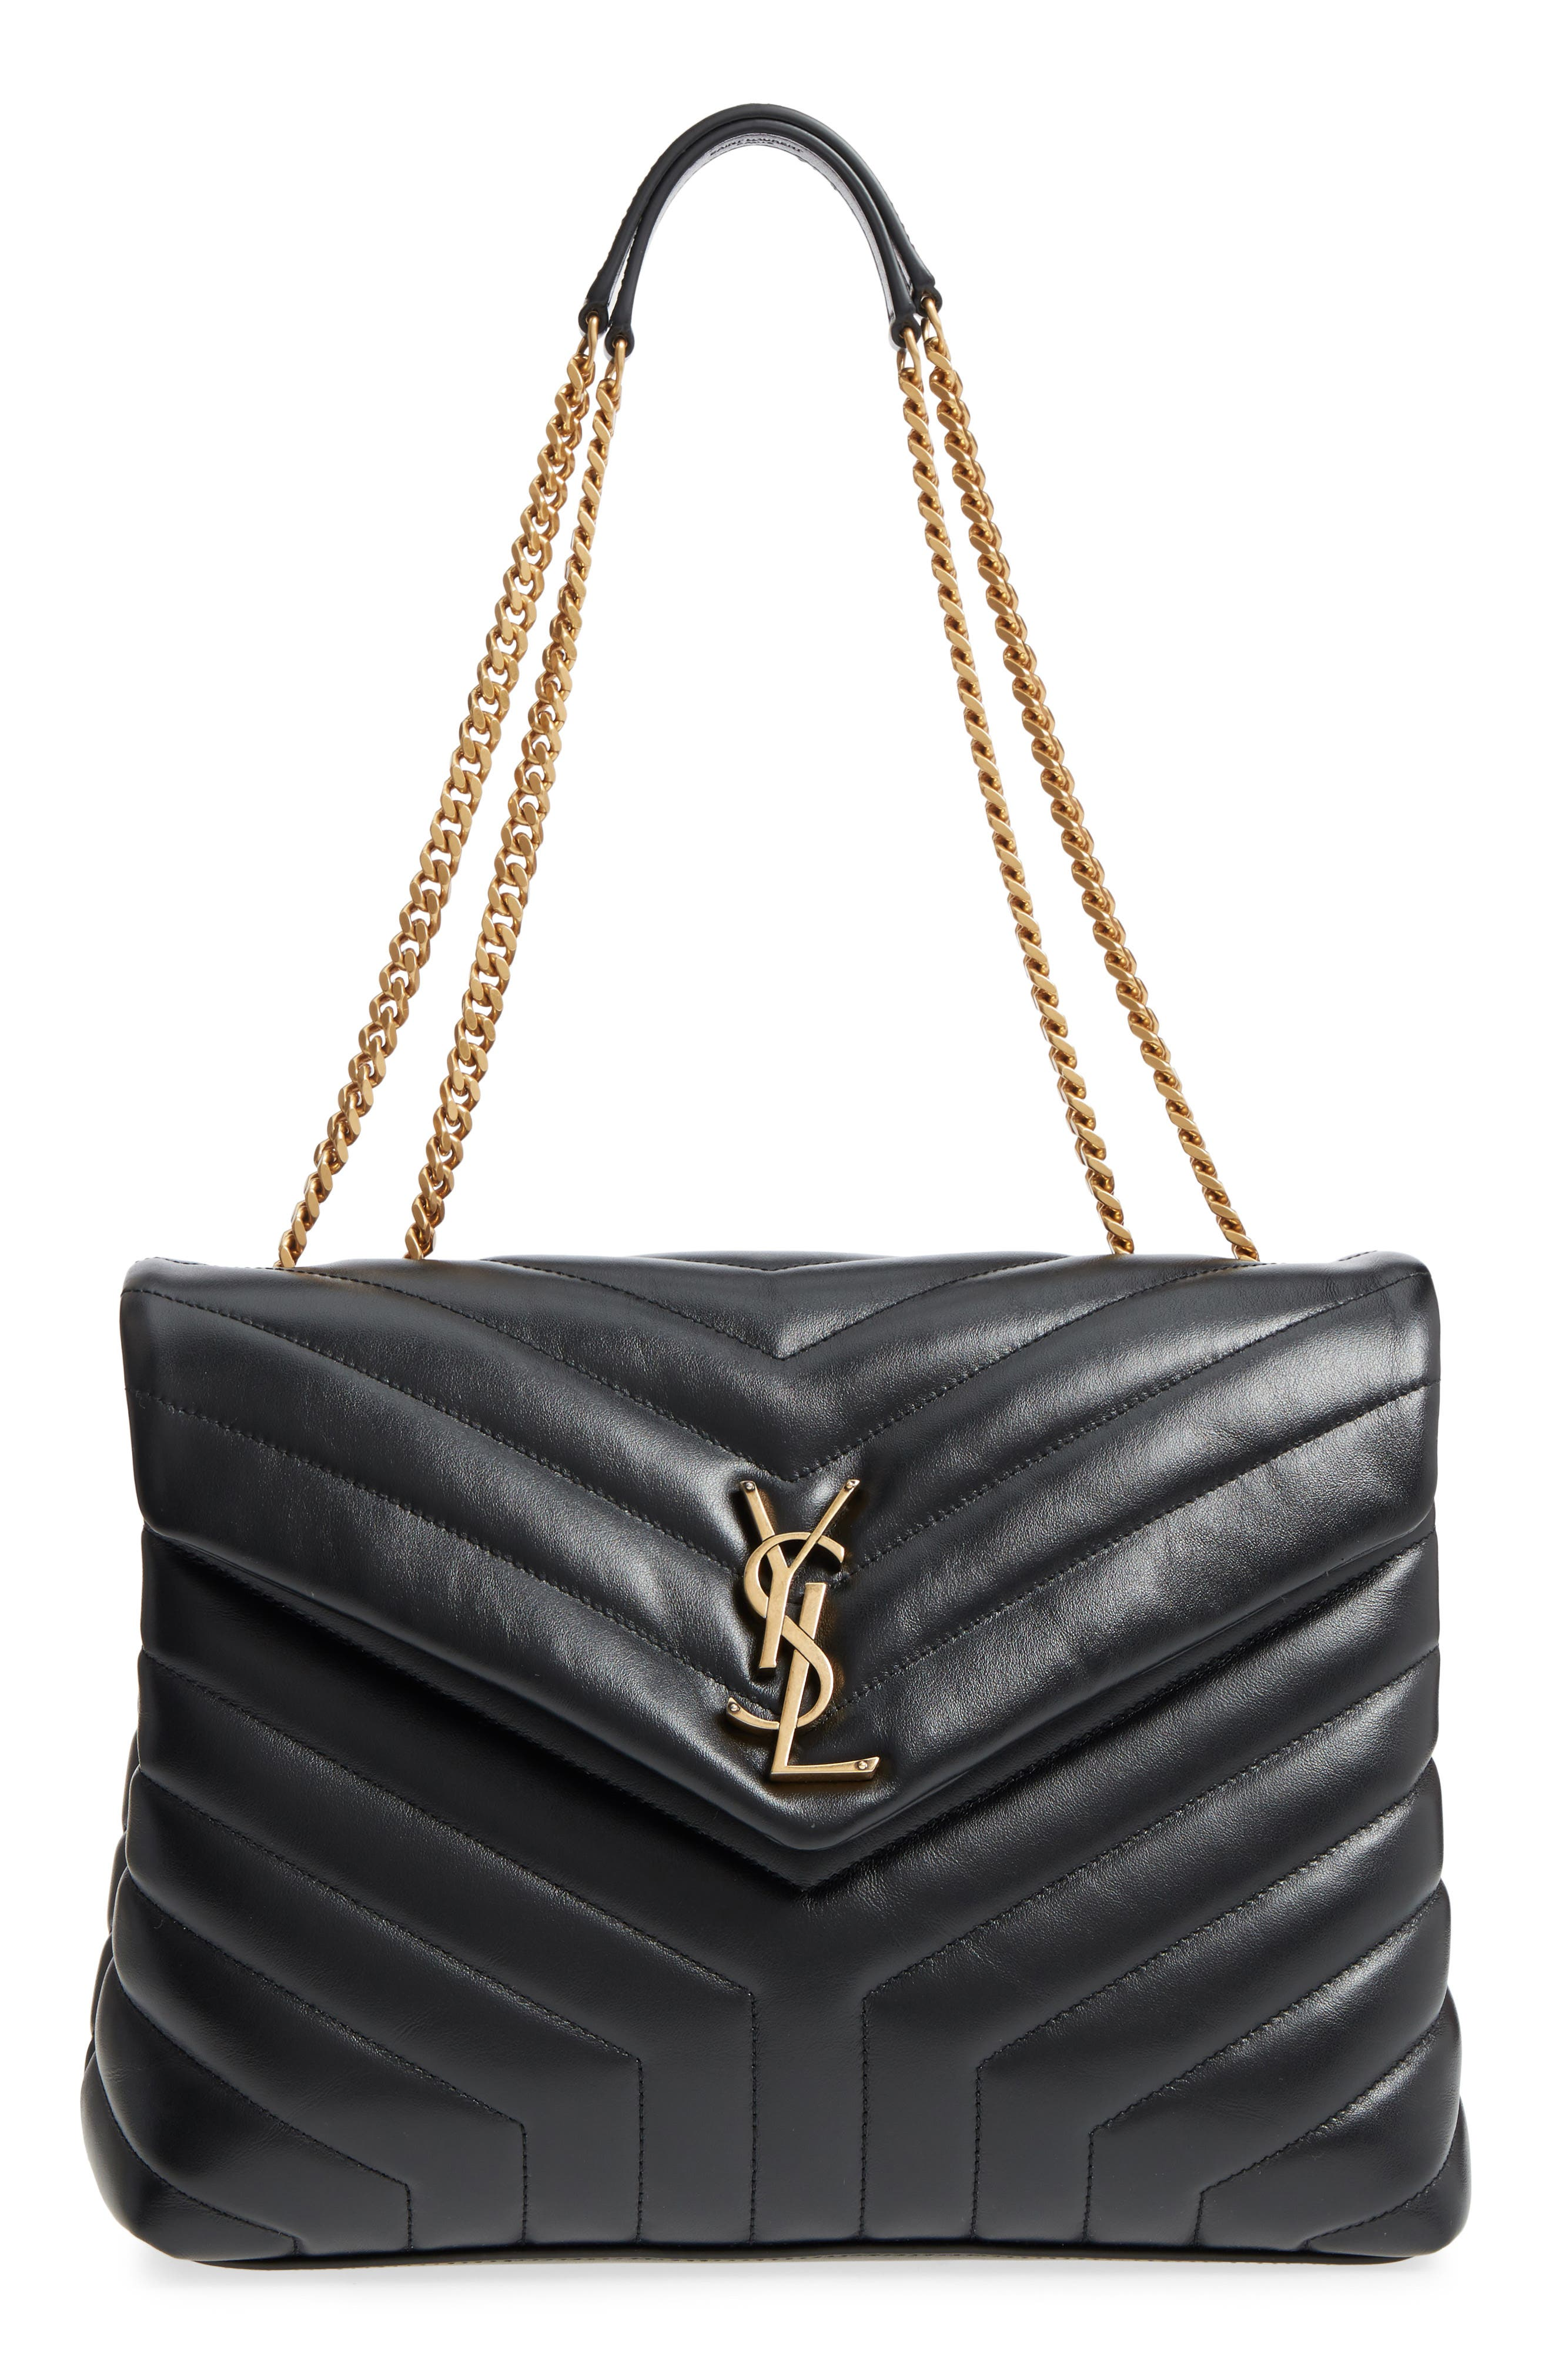 Stylish Handbags For Women